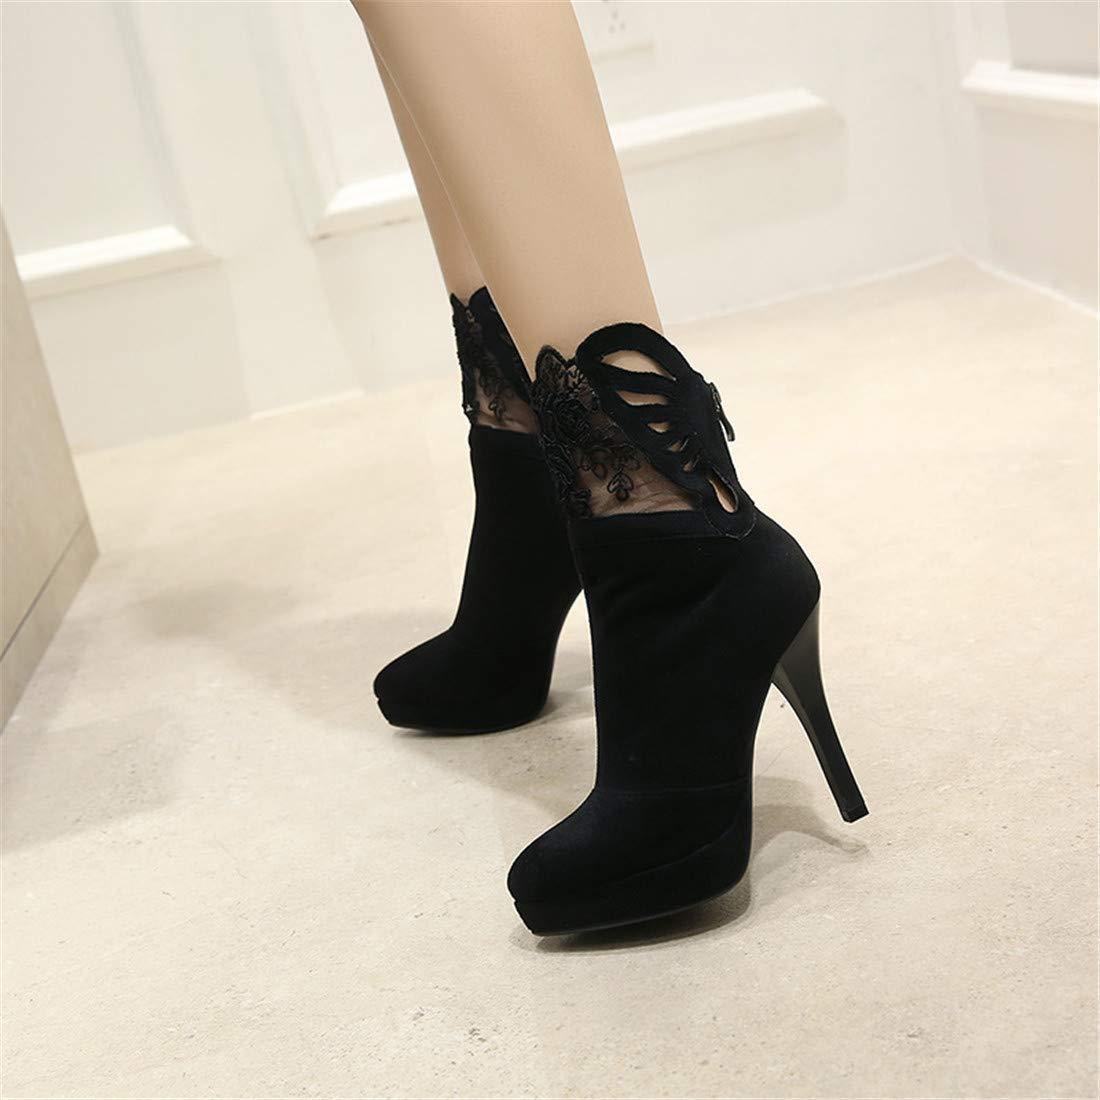 Stiefel-DEDE Stiefel   Mode Damenschuhe     Mode Spitze hochhackige Kurze Stiefel 79a004